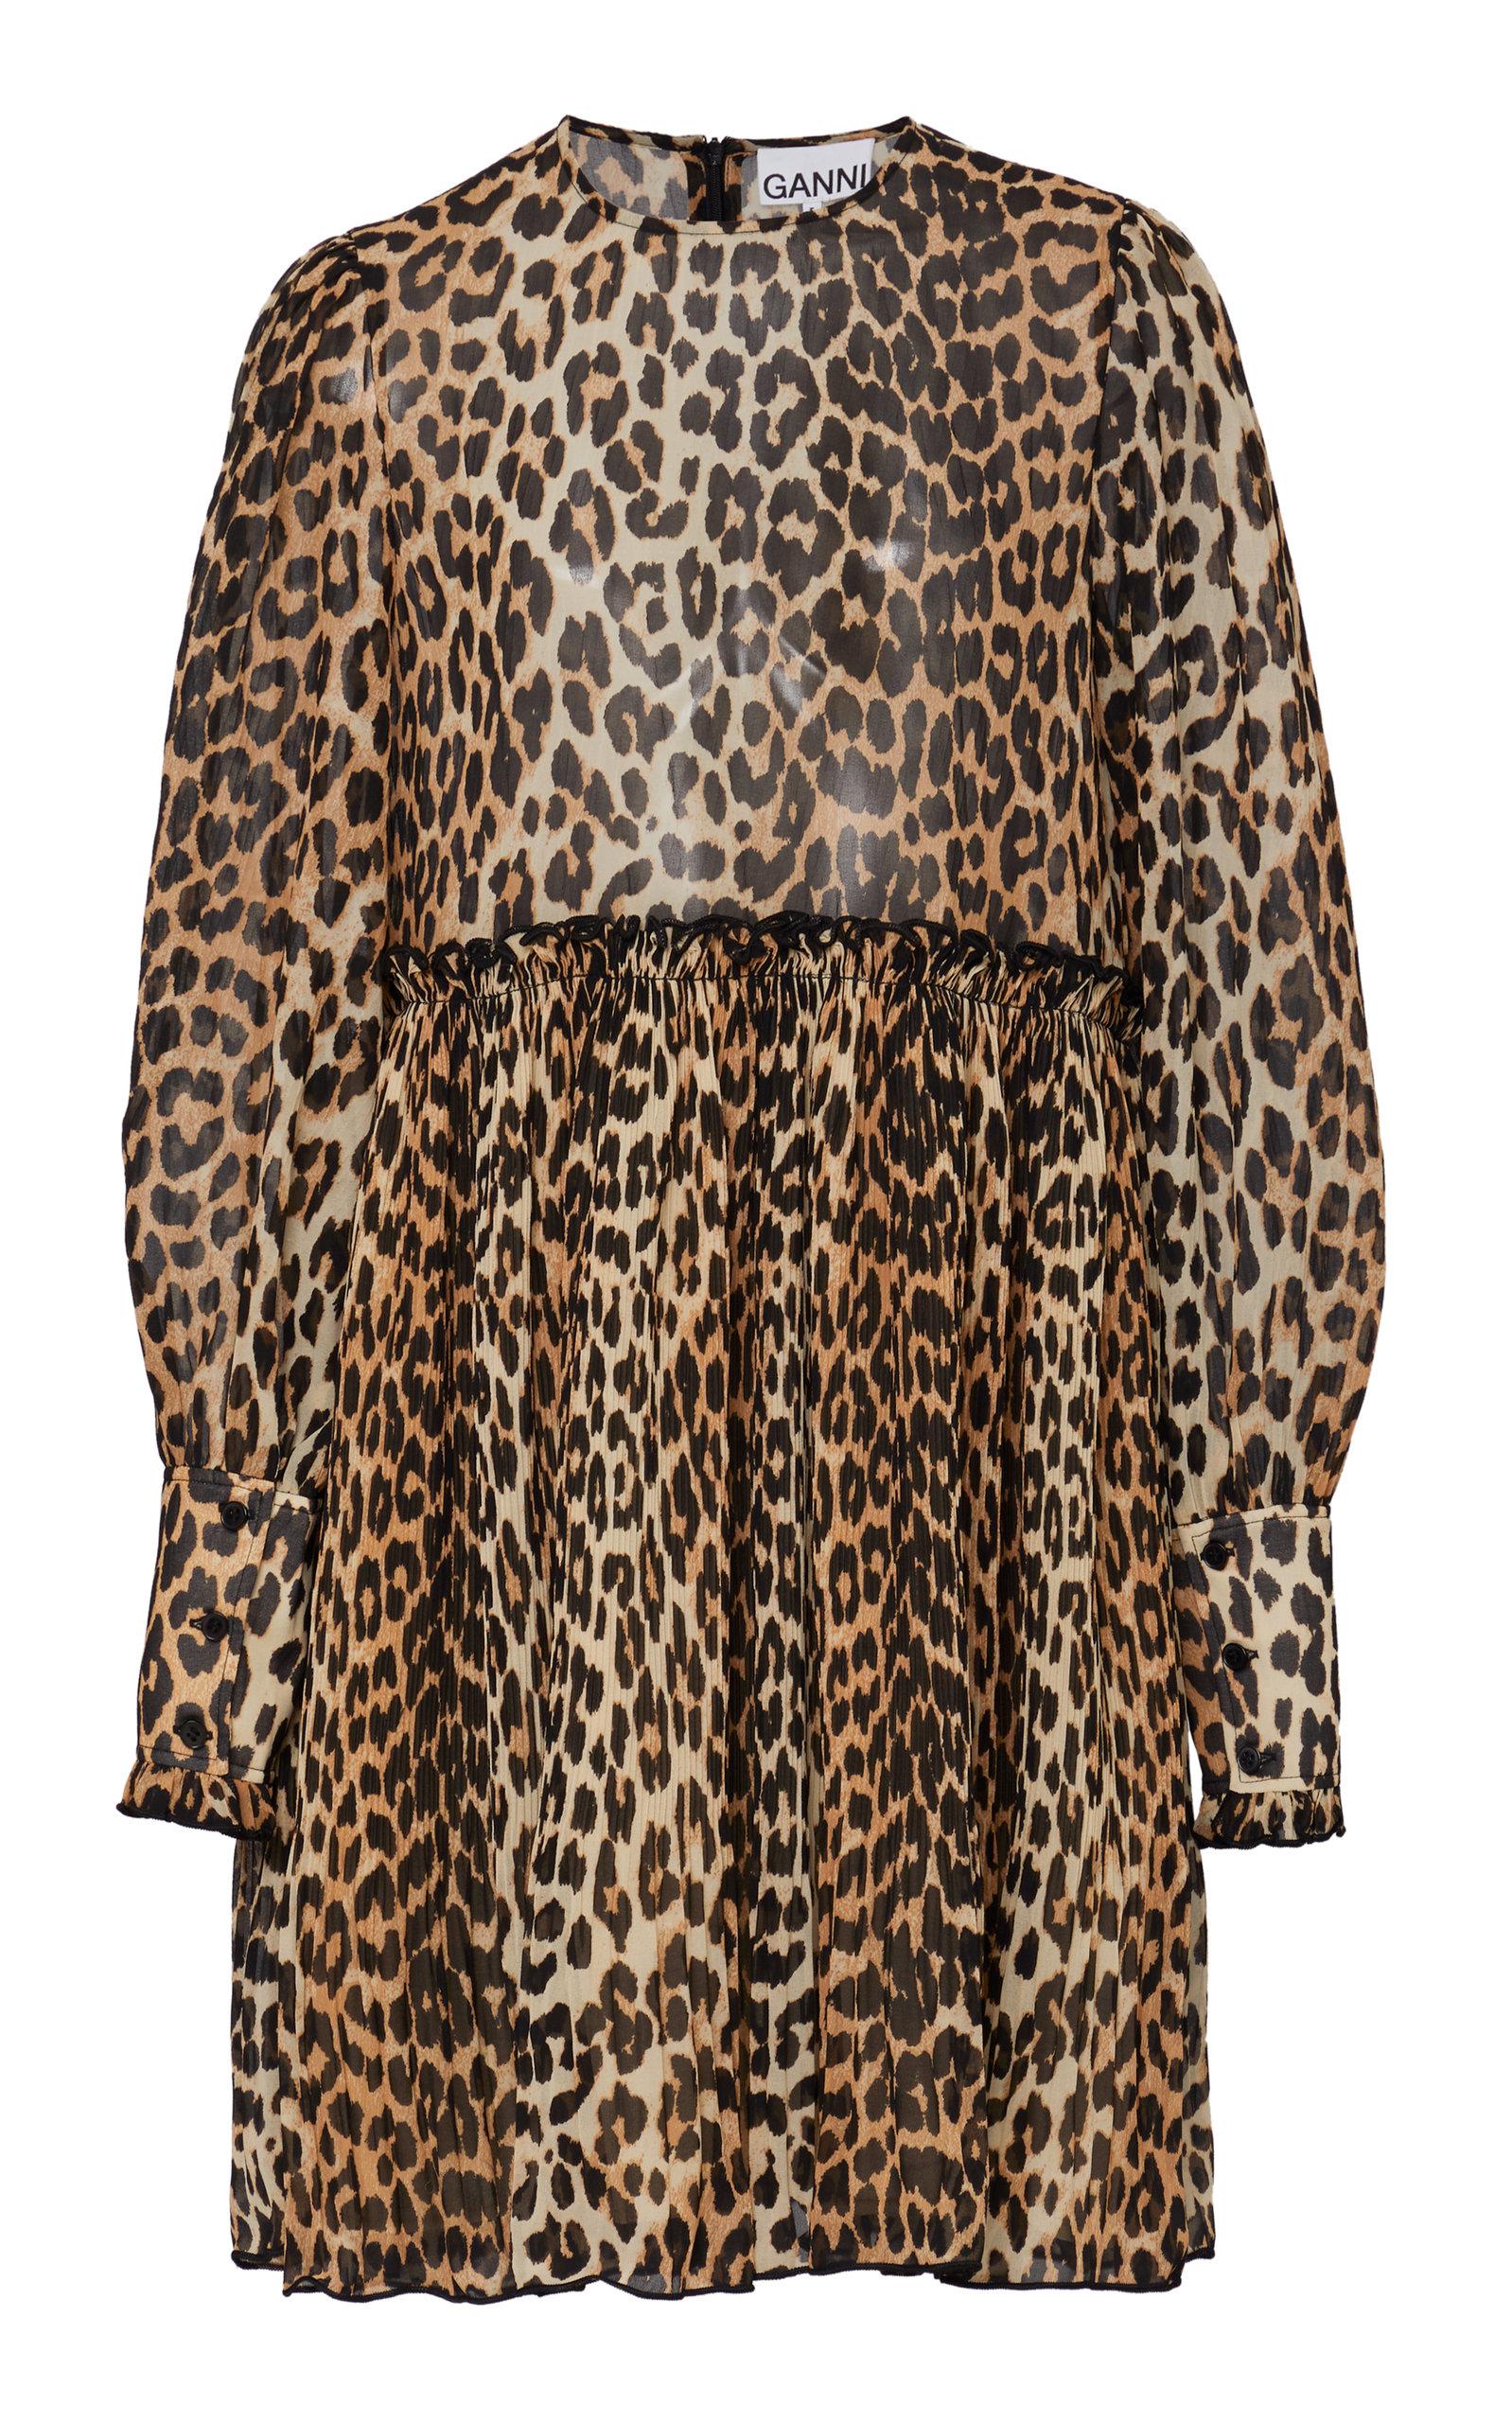 8c4771262bbe Leopard-Print Georgette Mini Dress by Ganni | Moda Operandi